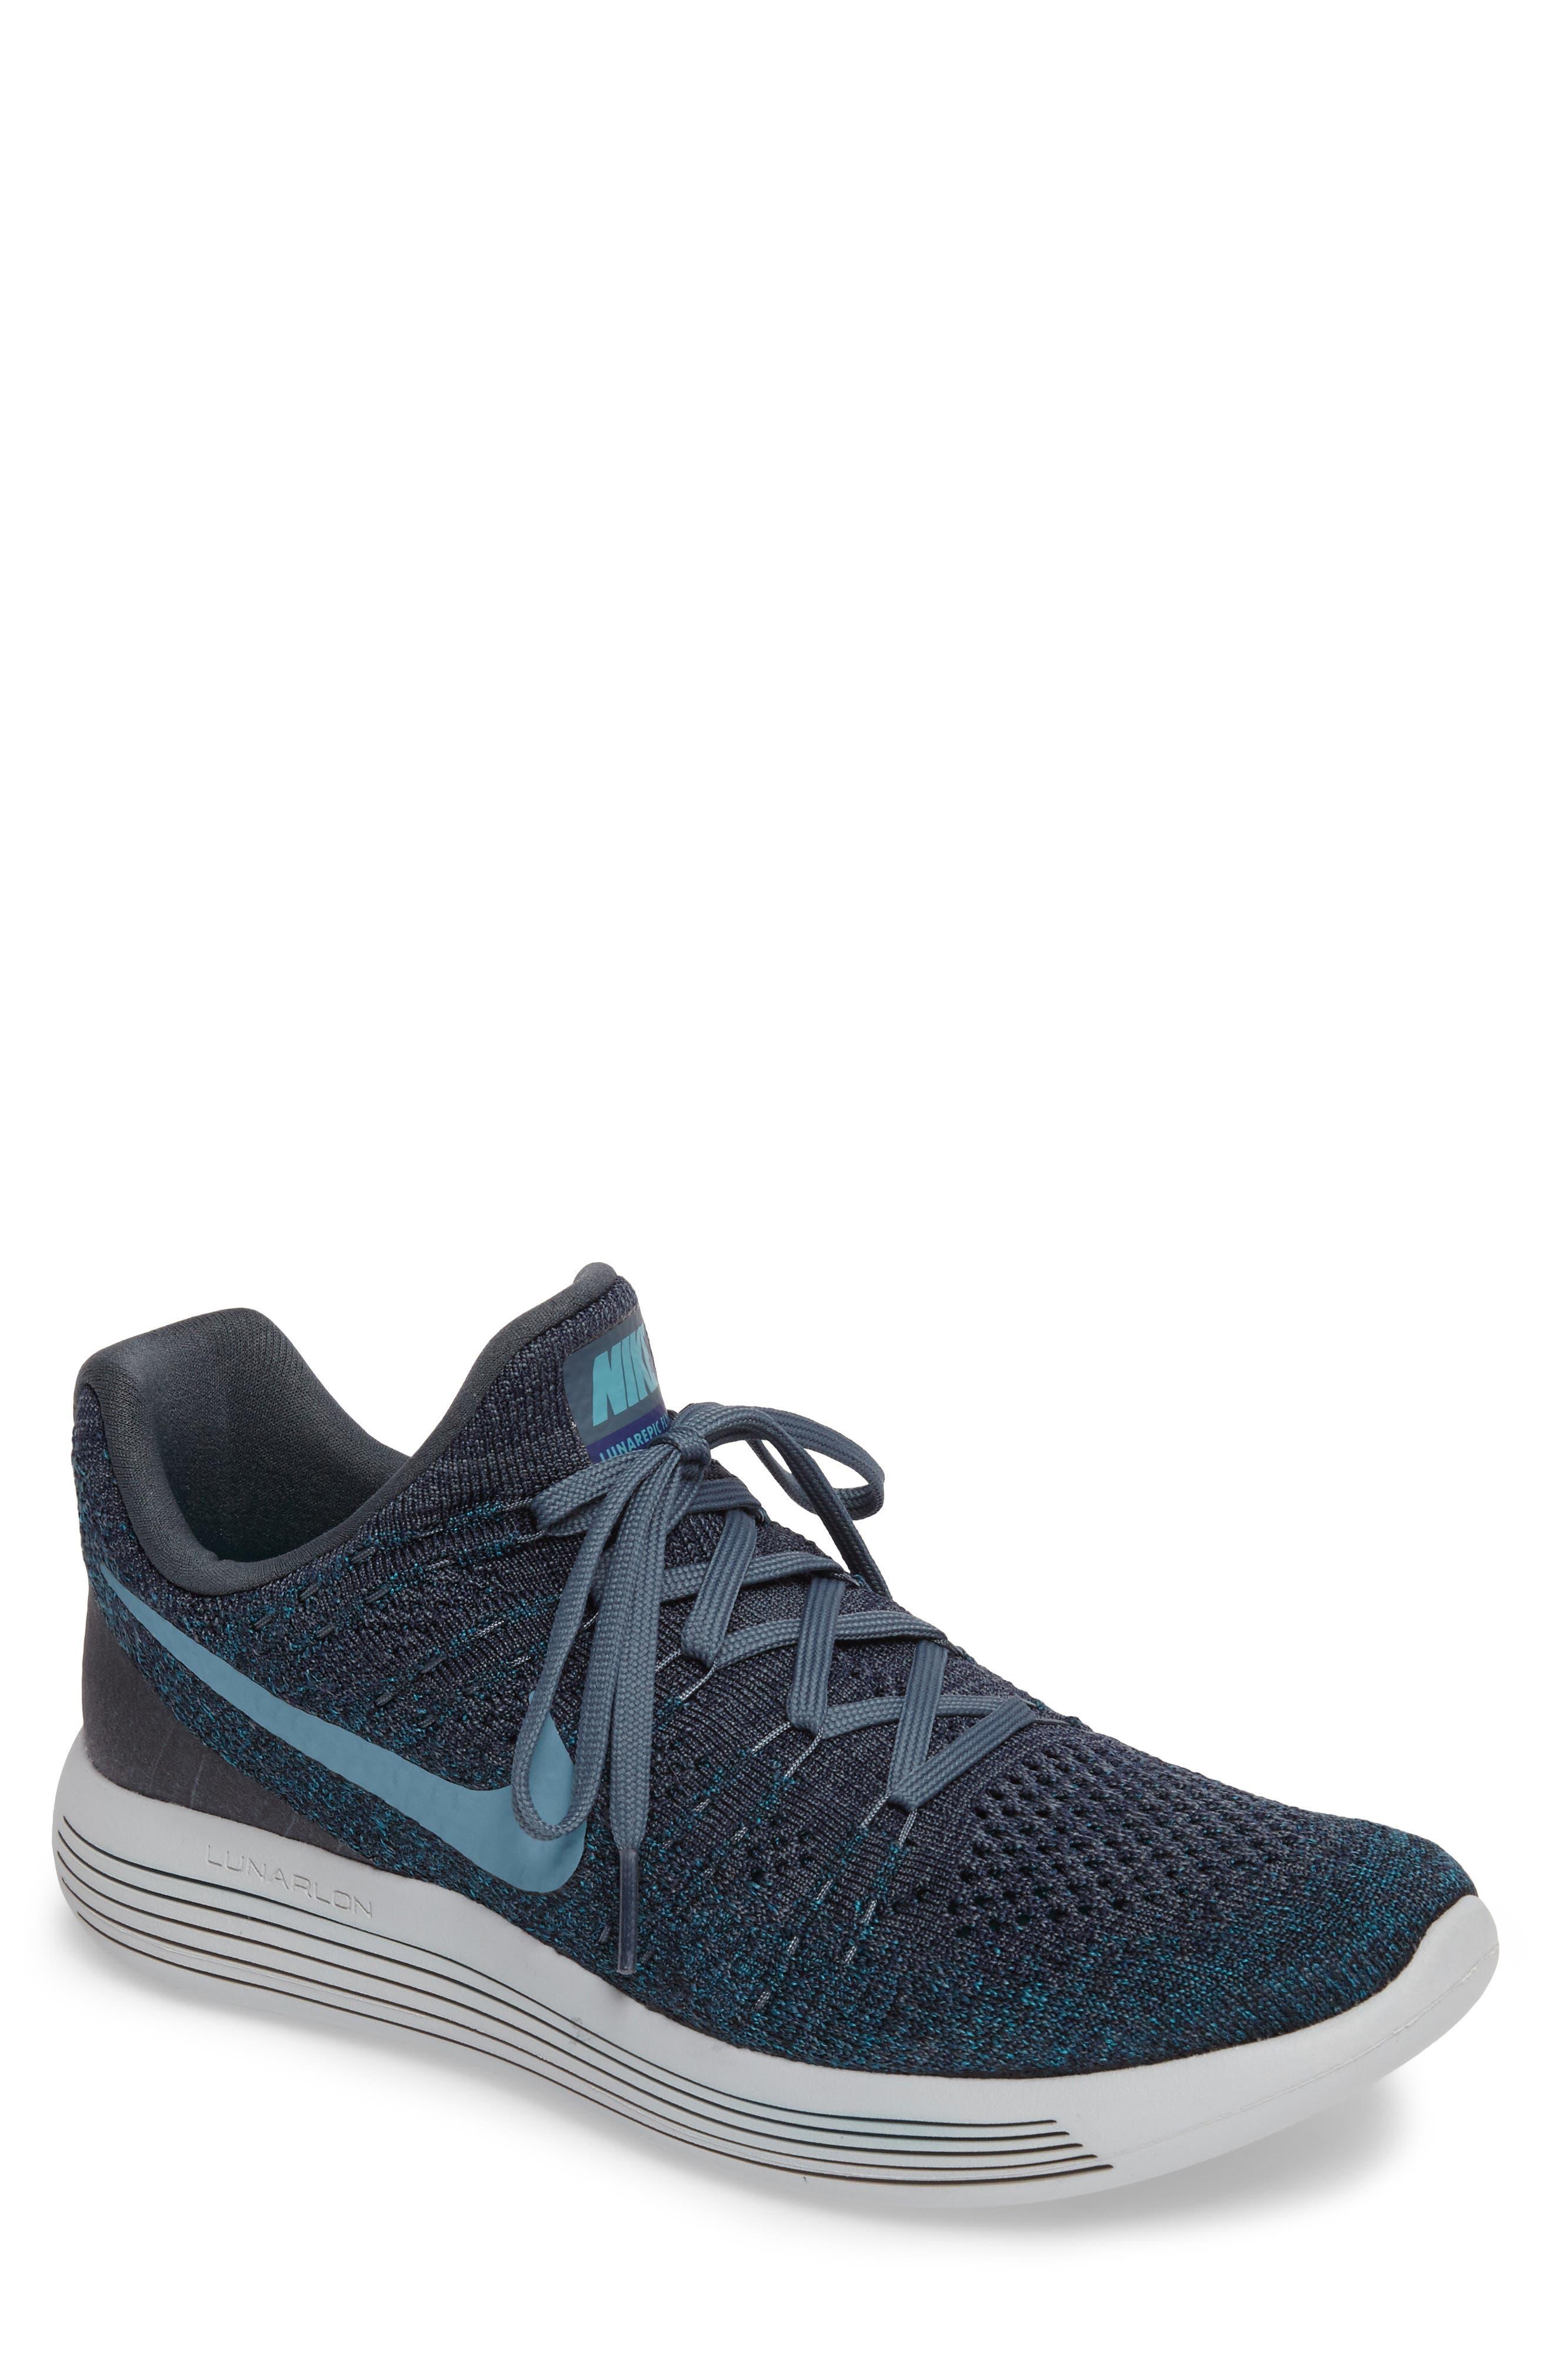 Nike Flyknit 2 LunarEpic Running Shoe (Men)